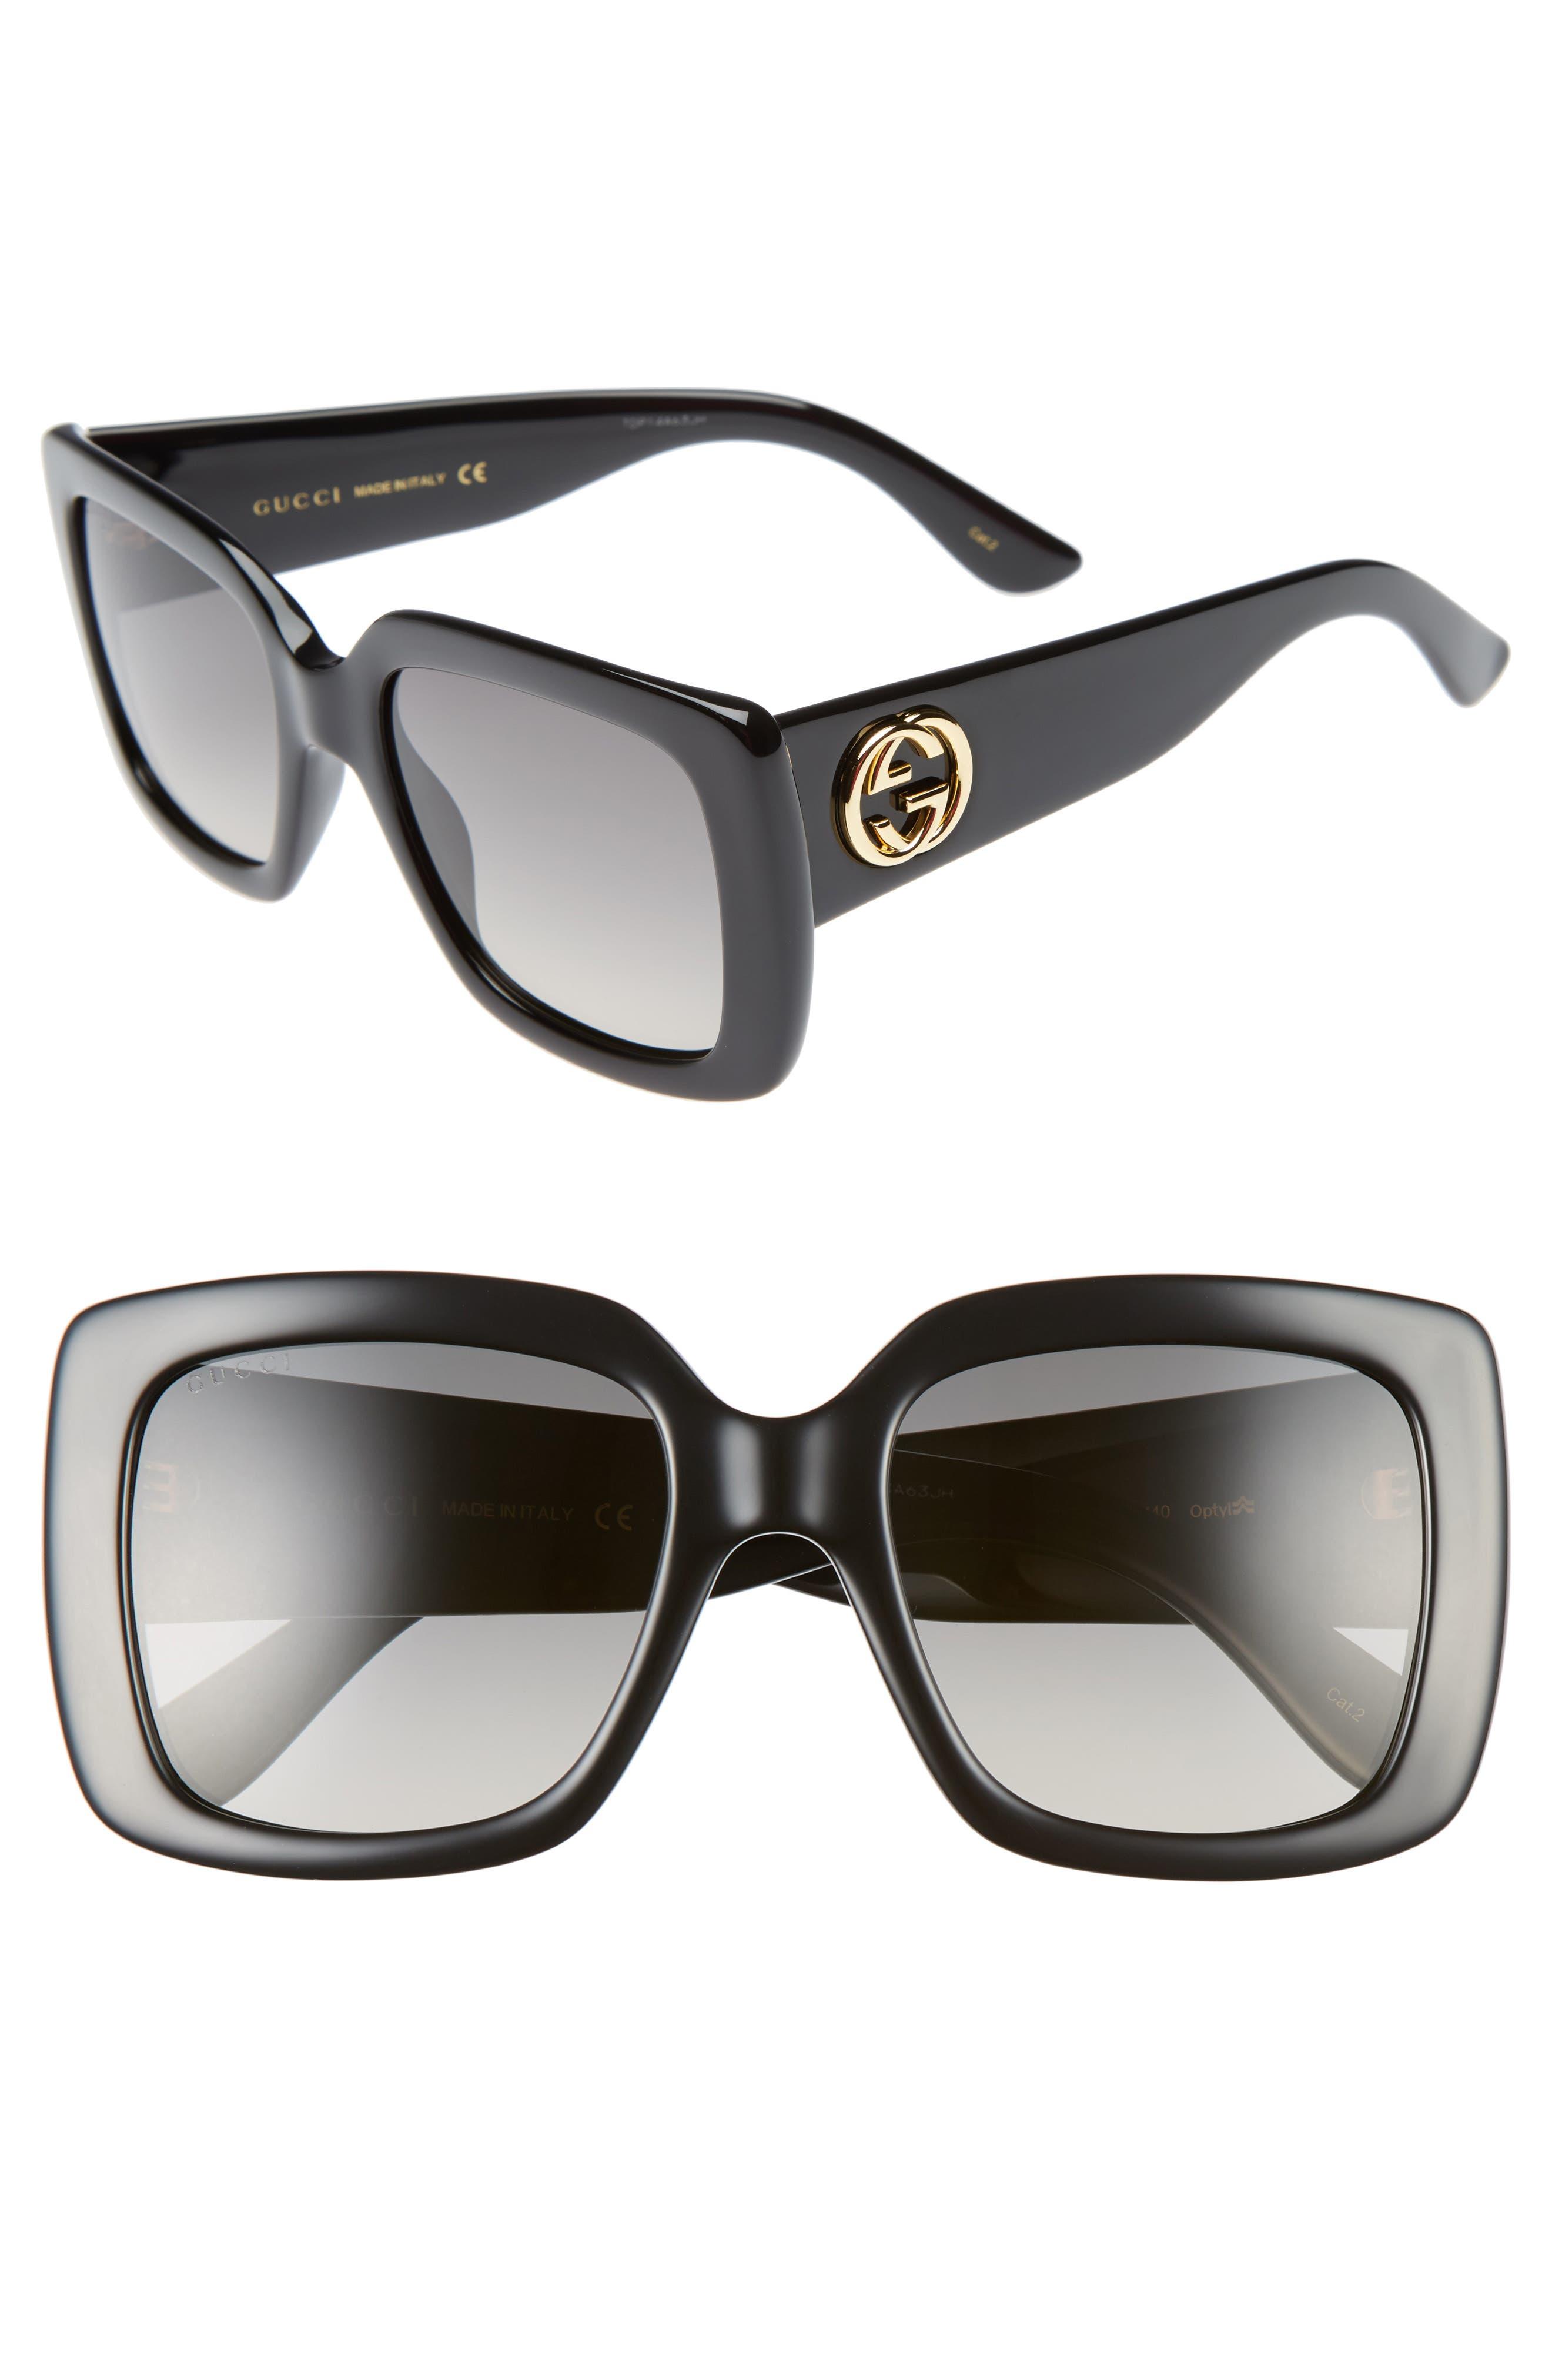 53mm Square Sunglasses,                             Main thumbnail 1, color,                             BLACK/ GREY